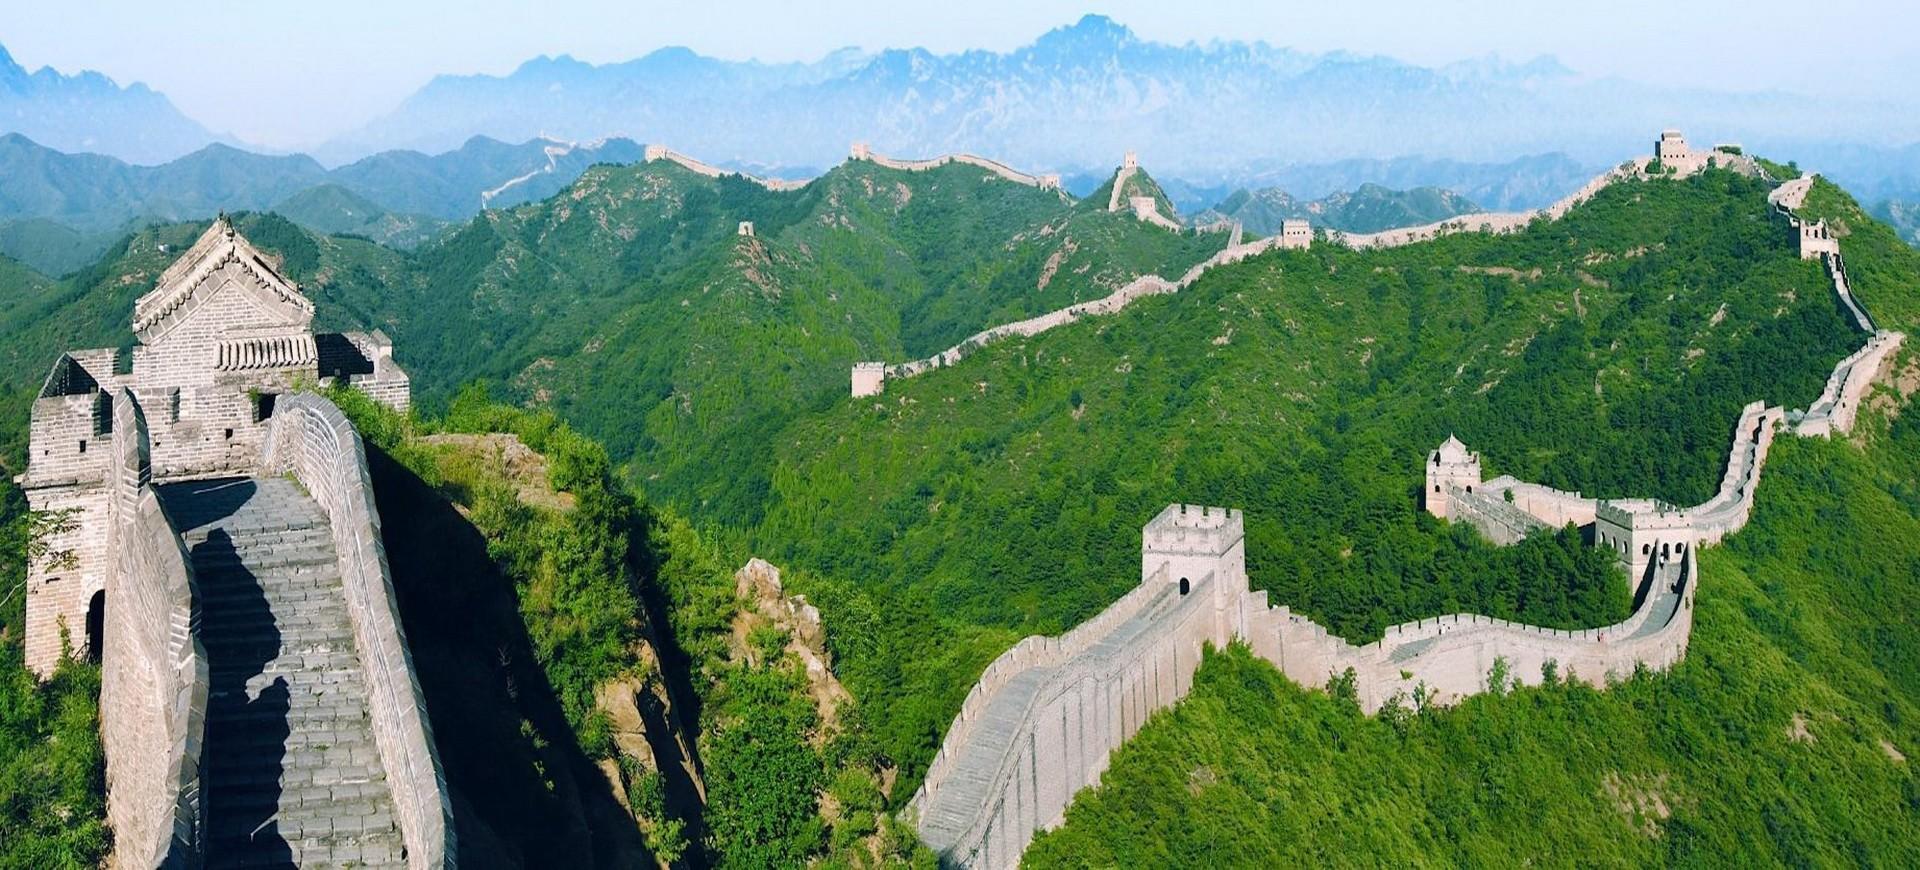 Chine Beijing Grande Muraille